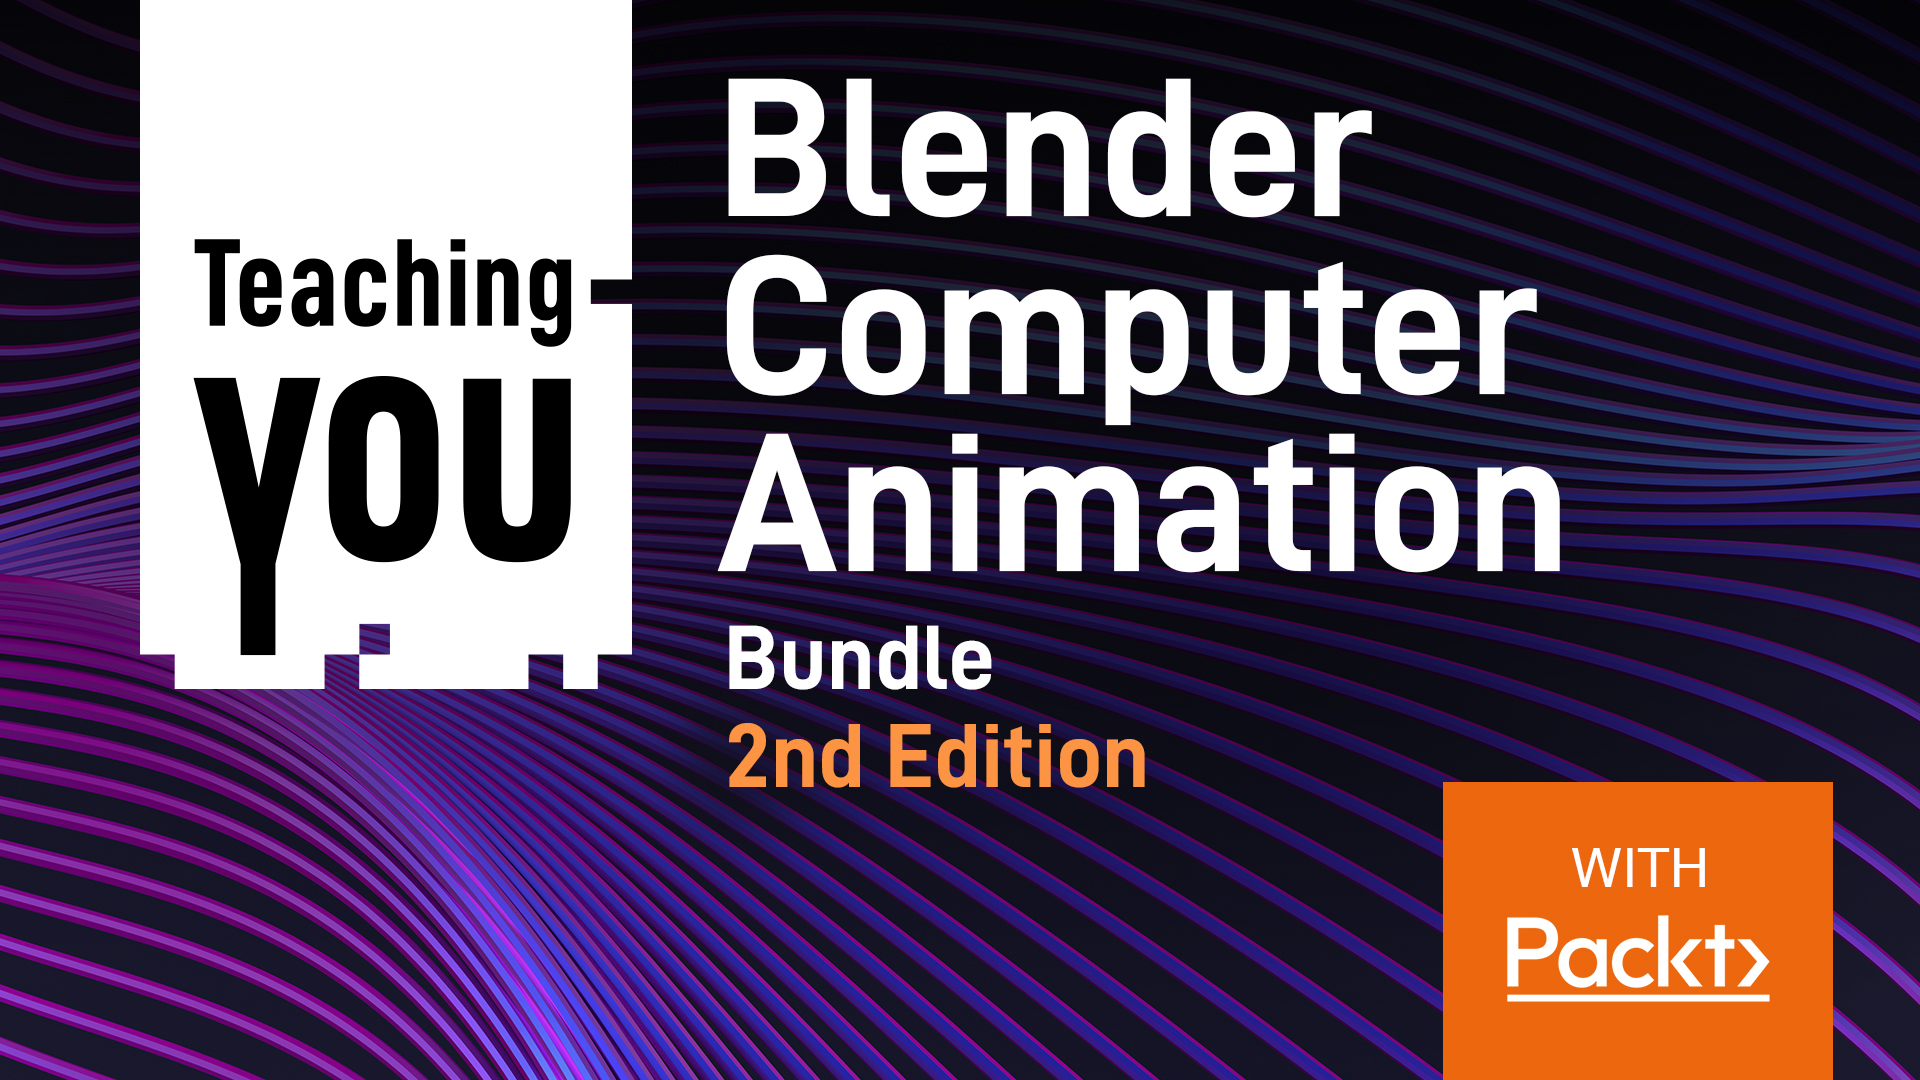 Blender Computer Animation Bundle 2nd Edition Ebook Bundle Fanatical